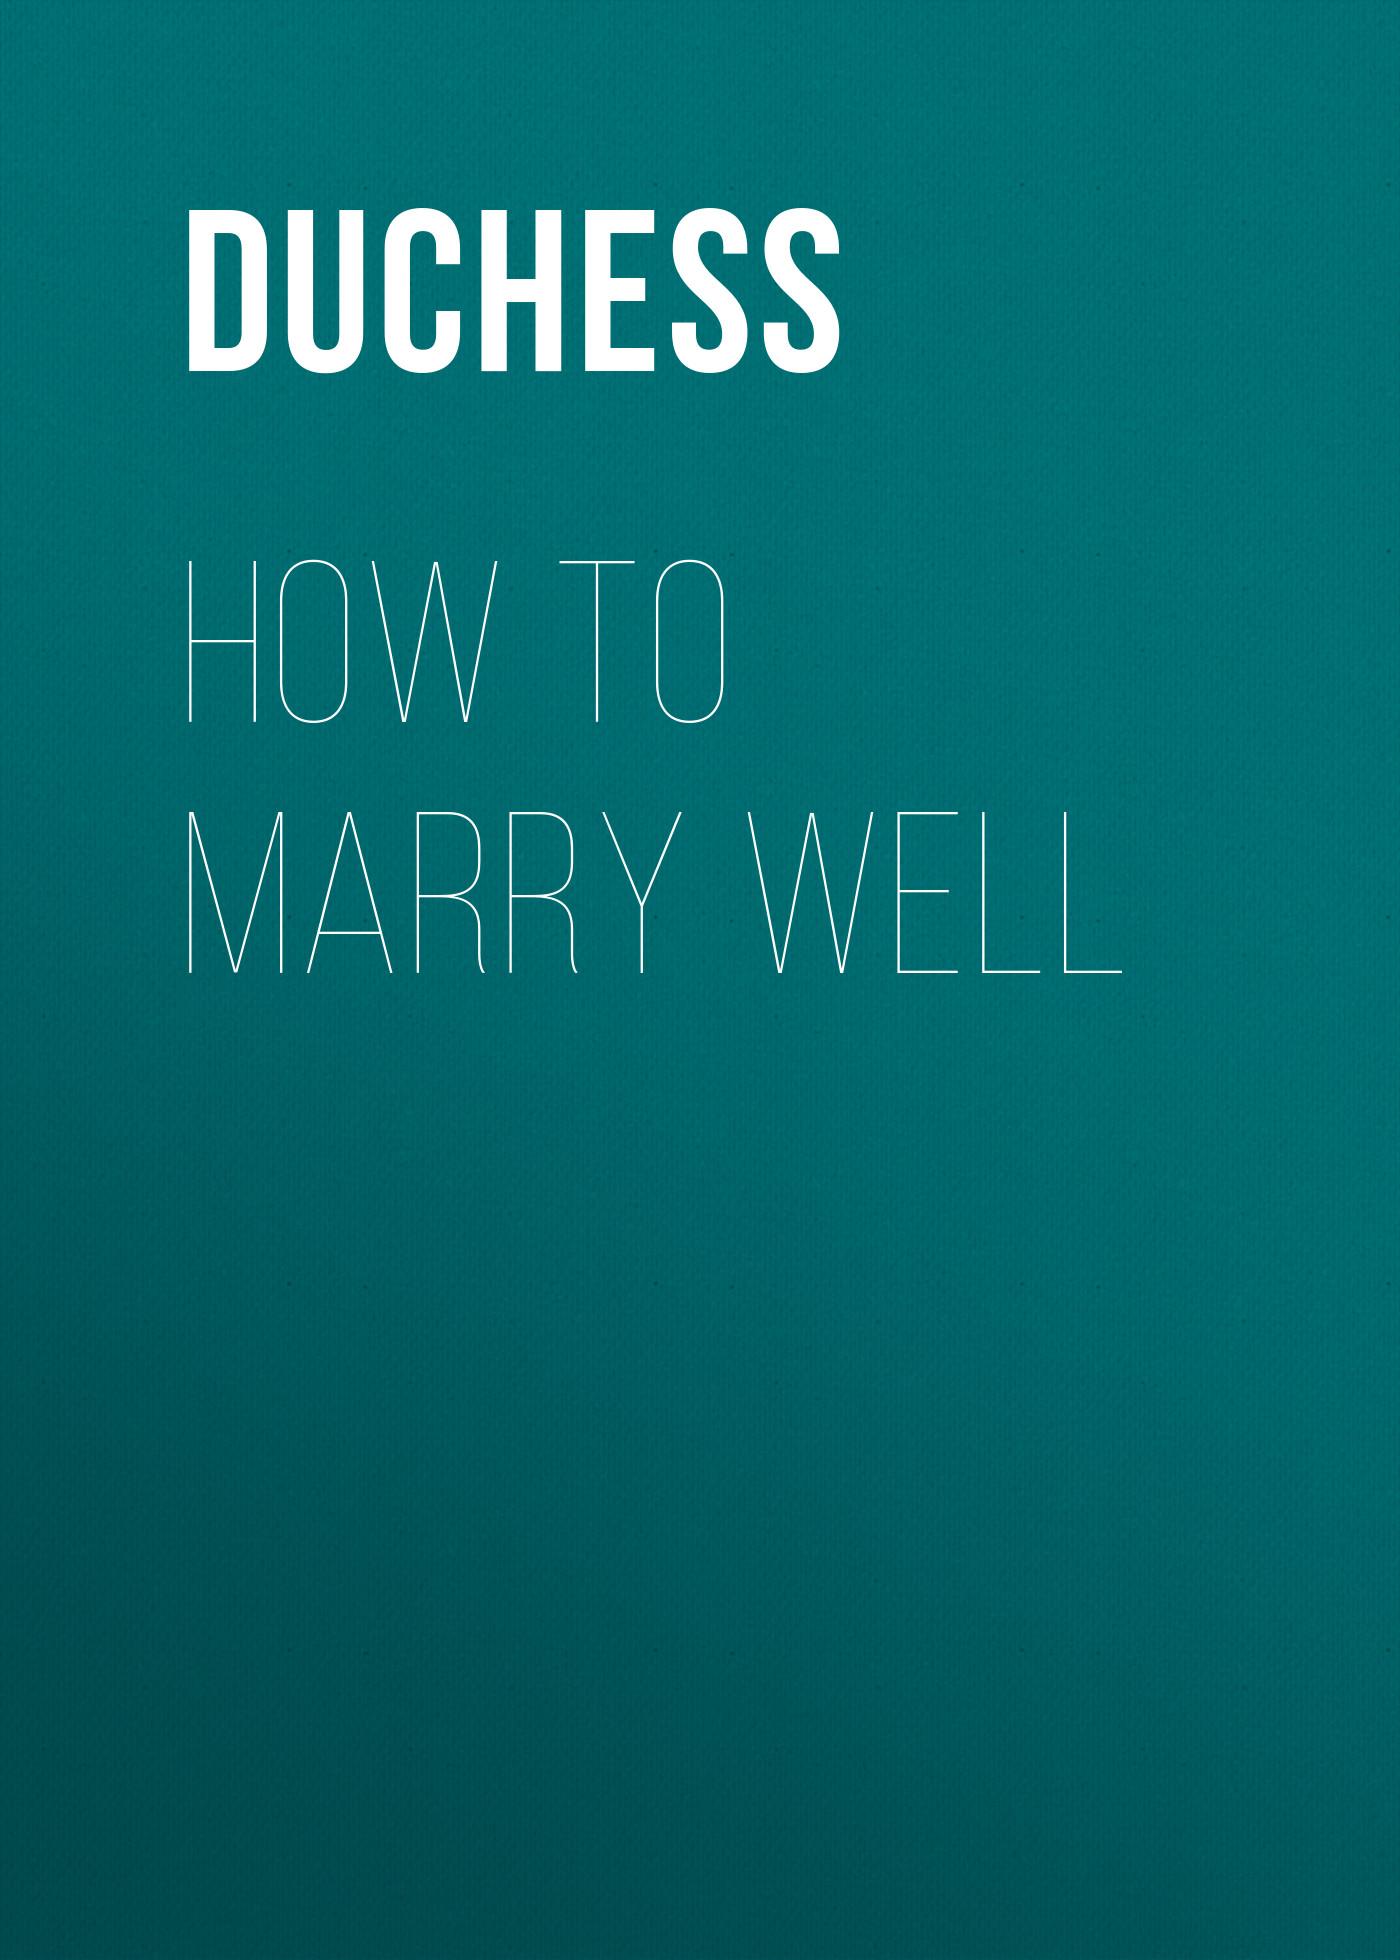 Duchess How to Marry Well duchess rossmoyne